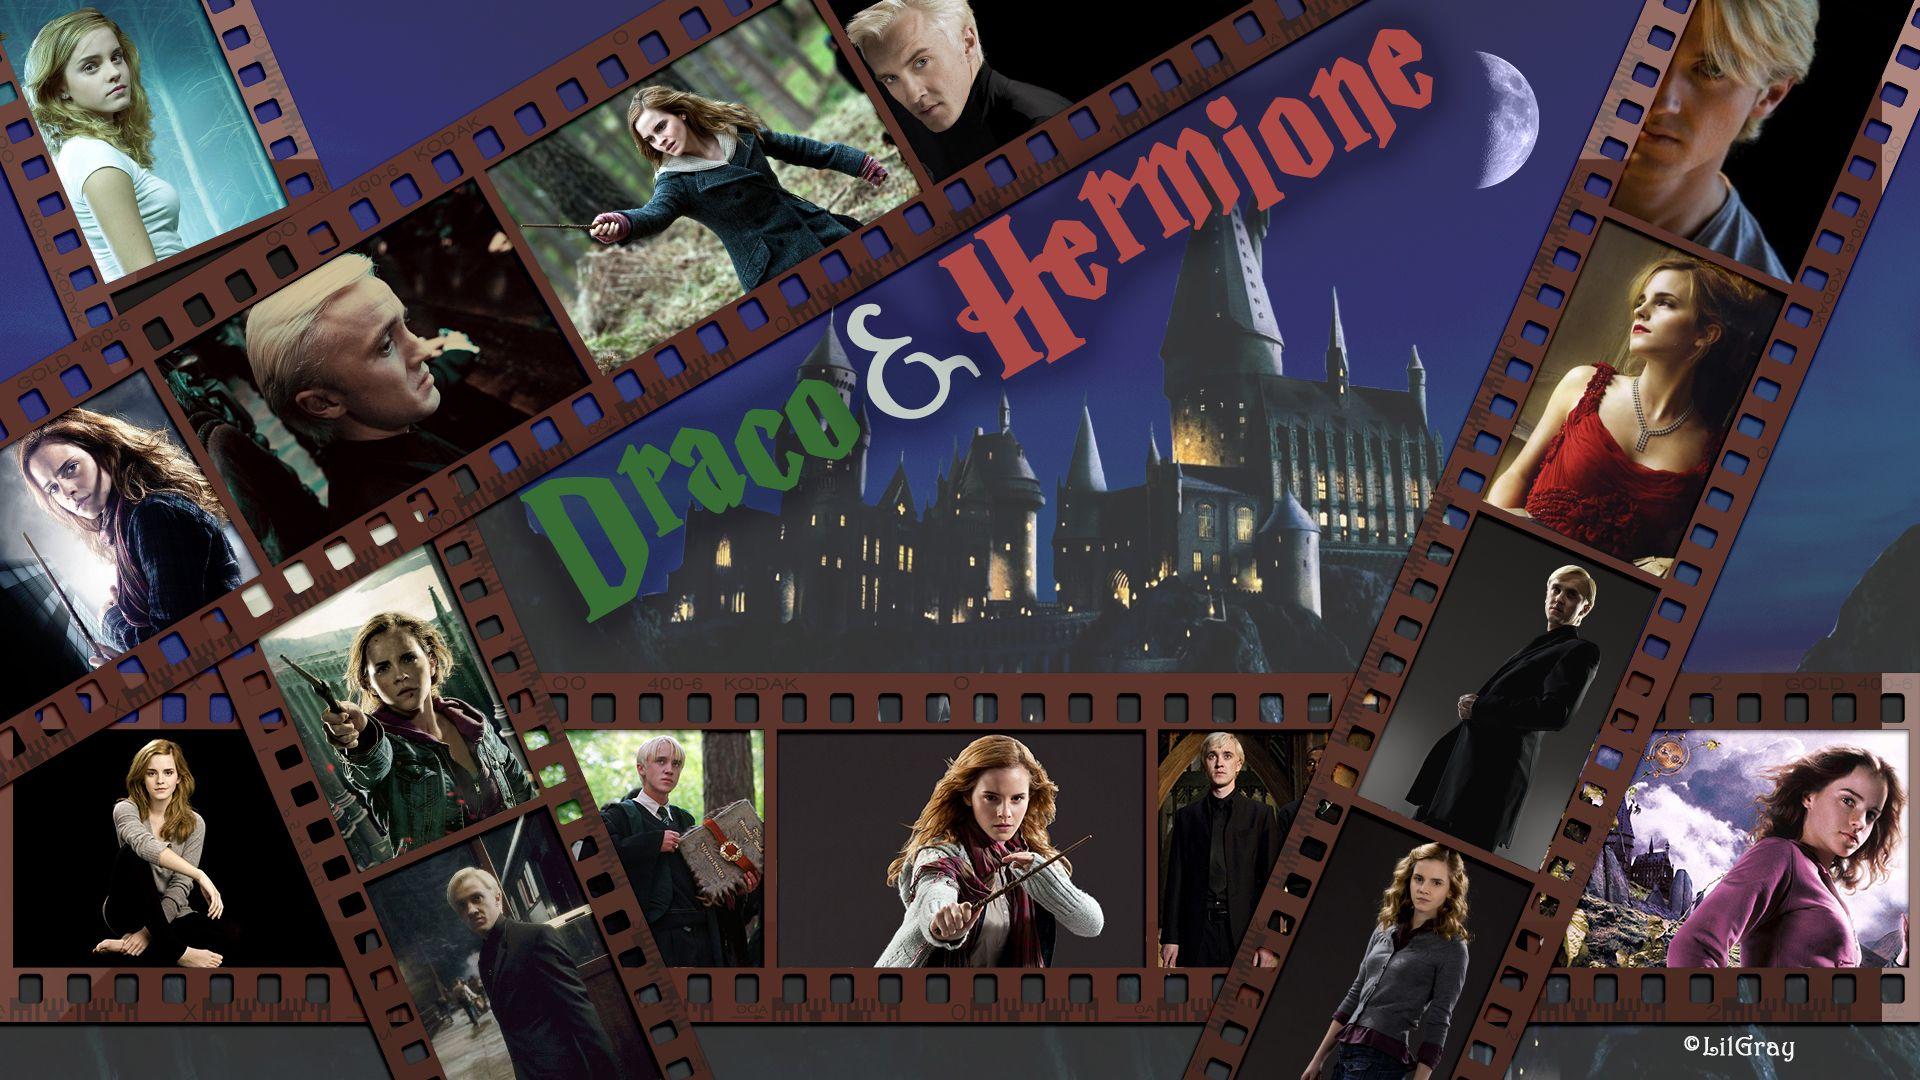 Draco Malfoy Hermione Granger Filmstrip Wallpaper I Made Draco Malfoy Stripped Wallpaper Hermione Granger